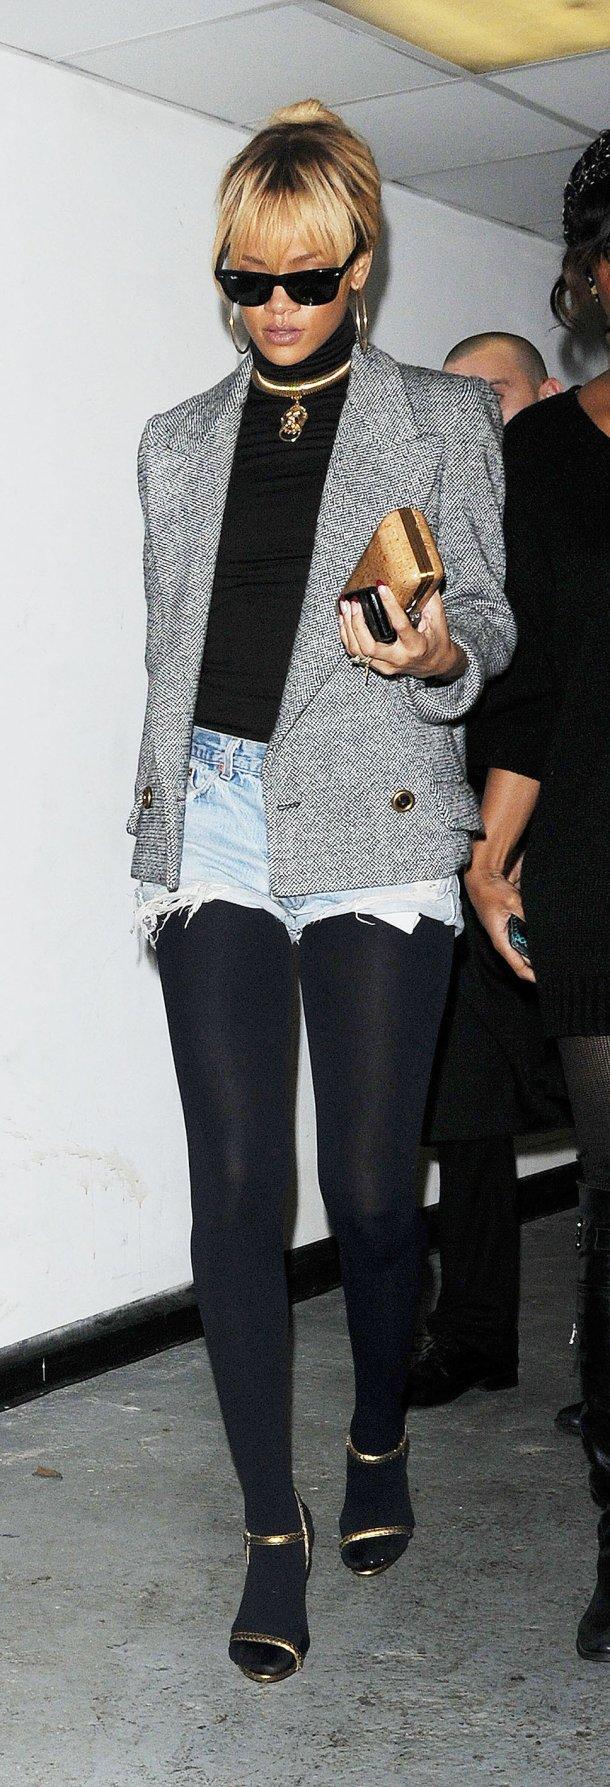 Rihanna - denim cutoffs & black tights